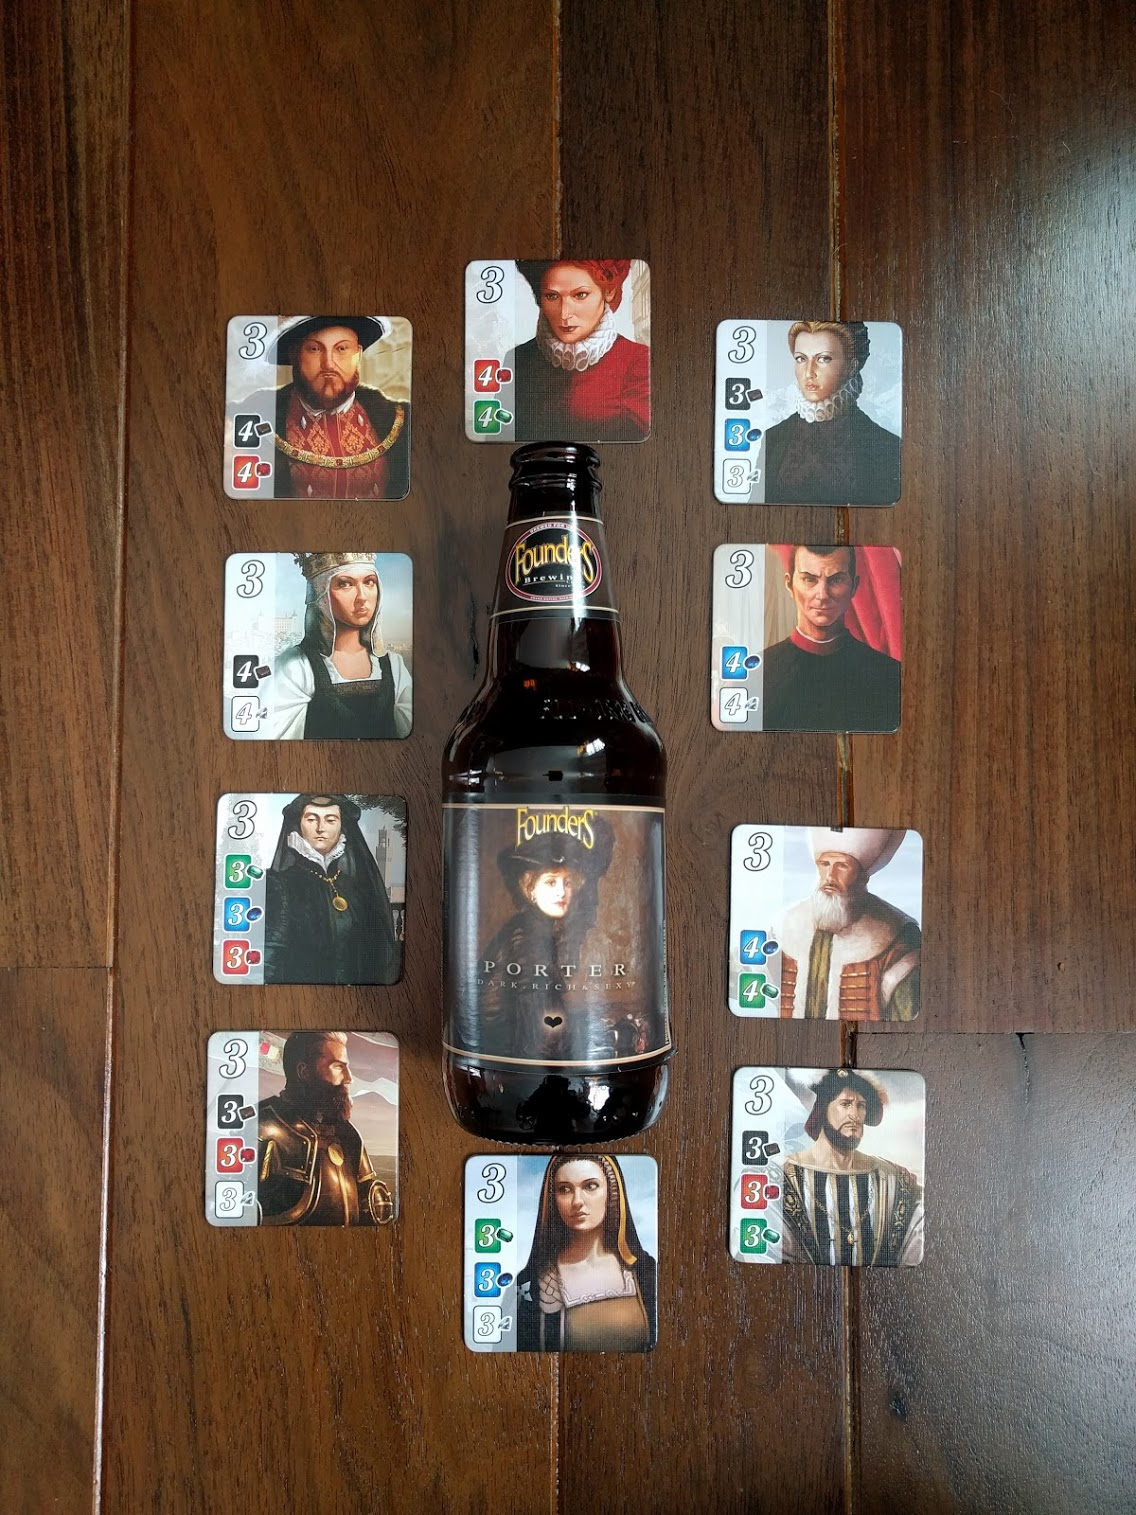 Spendor_board_game_and_Founders_Porter_beer_001.jpg